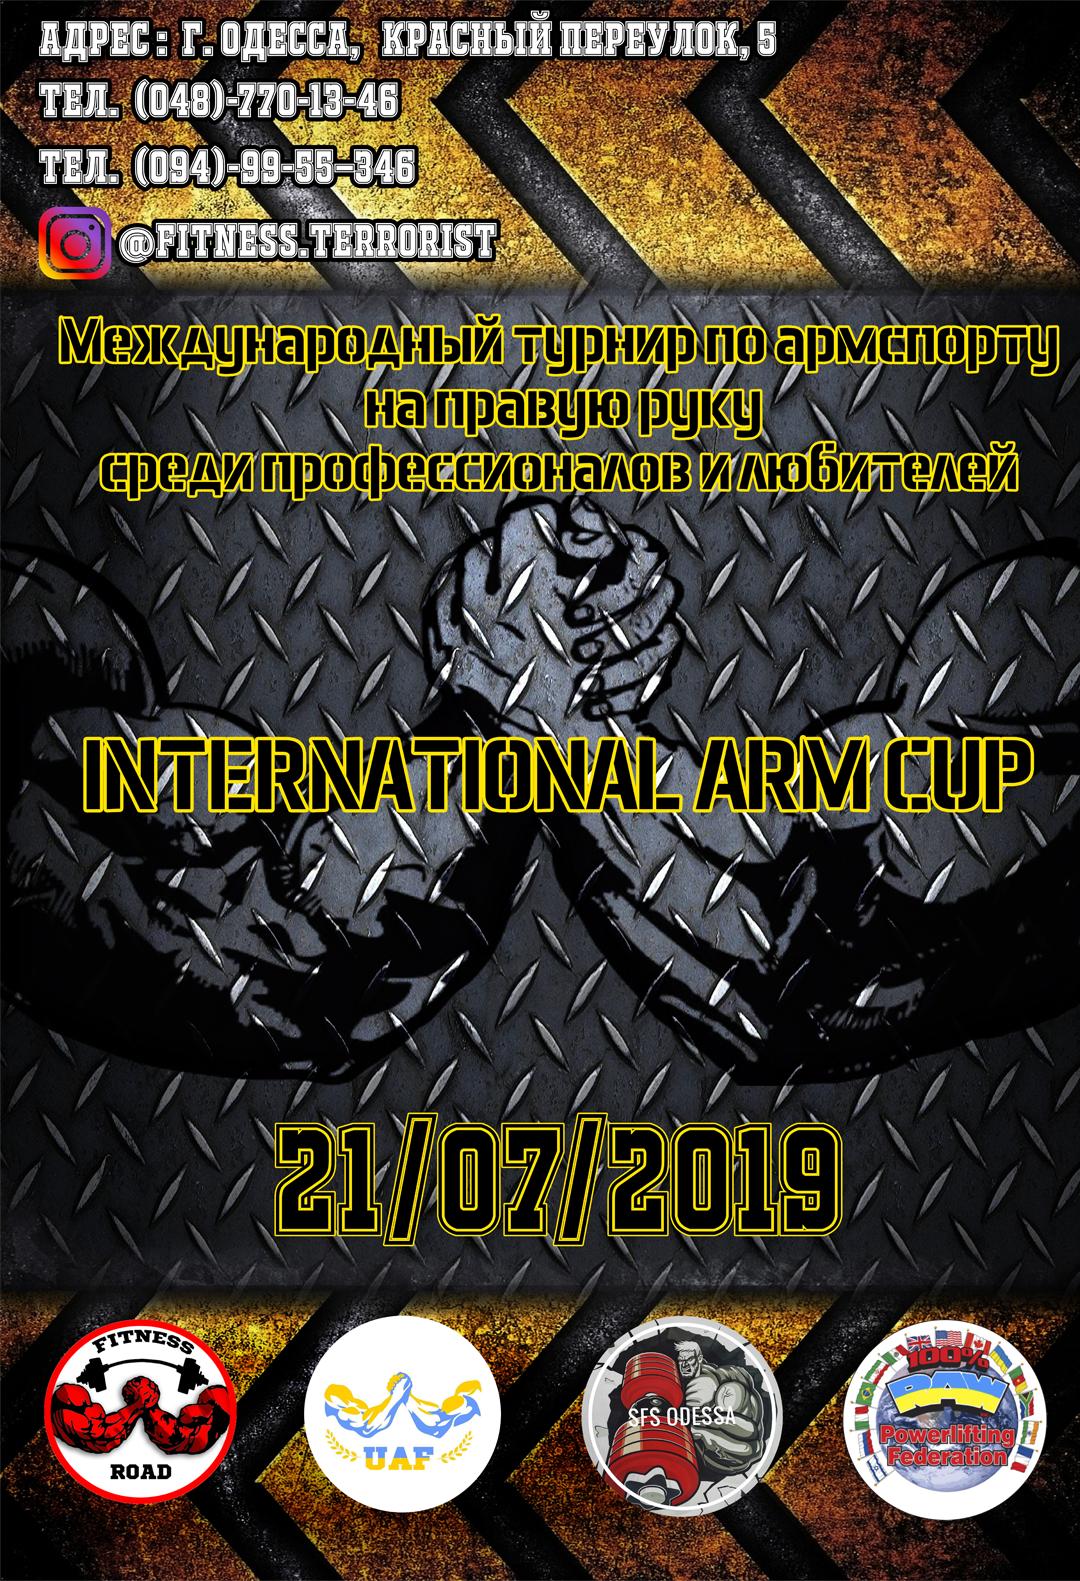 INTERNATIONAL ARM CUP 2019